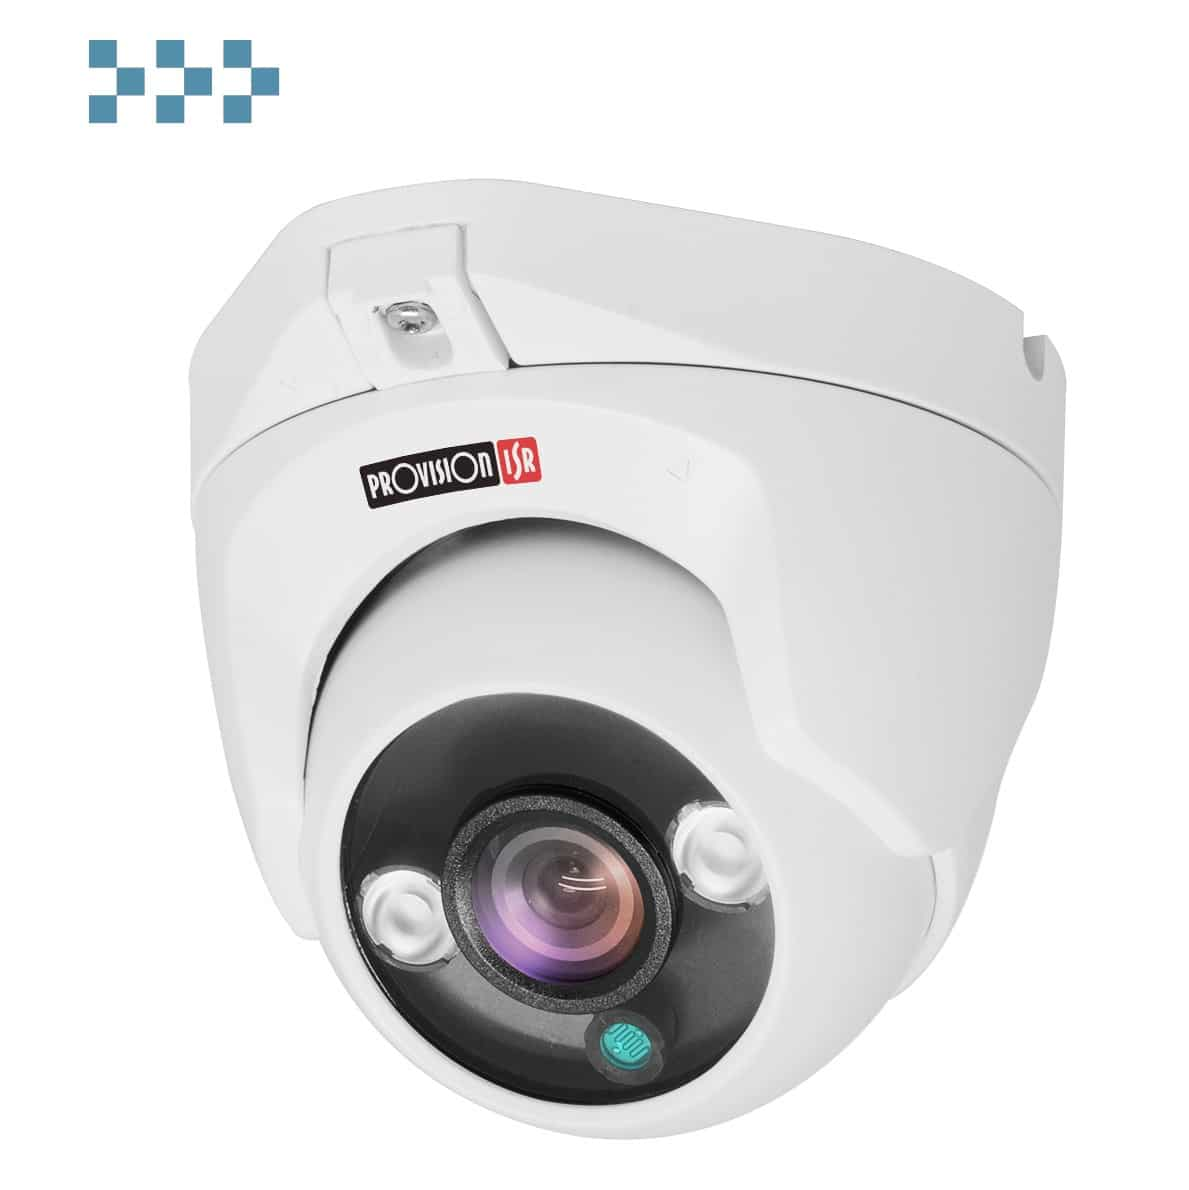 AHD камера Provision-ISR DI-350A36